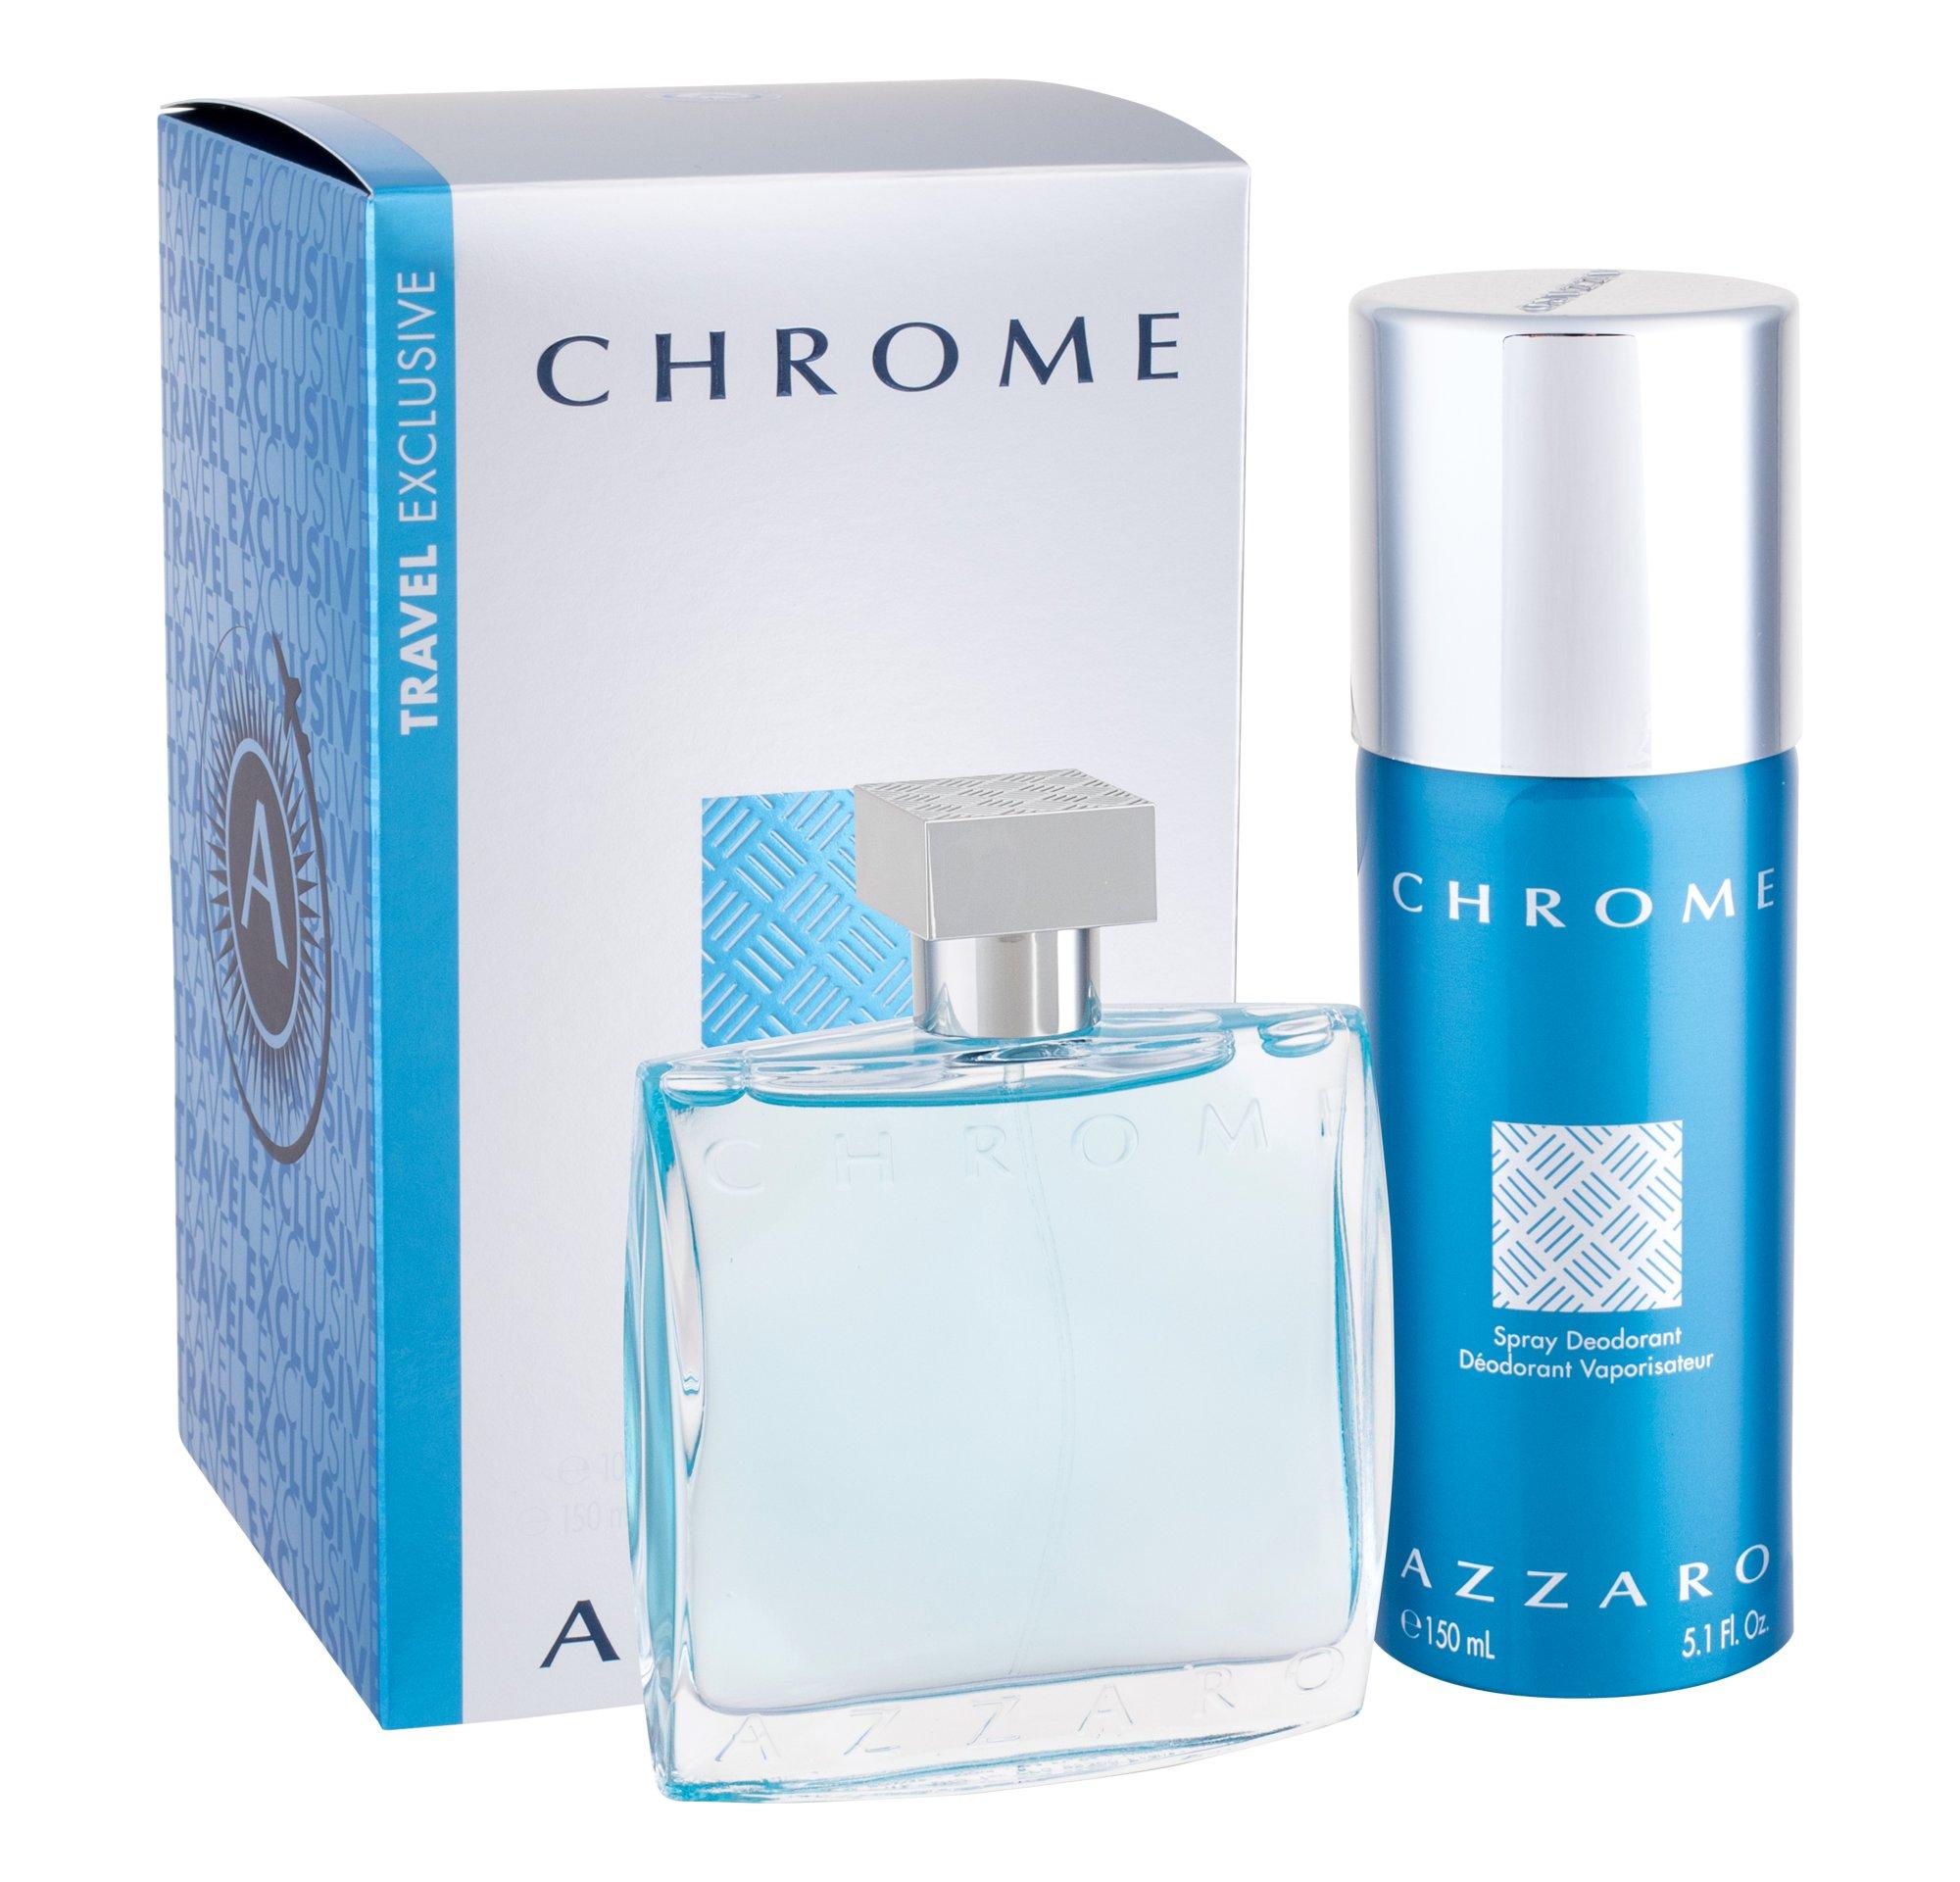 Azzaro Chrome, Edt 100ml + 150ml deodorant